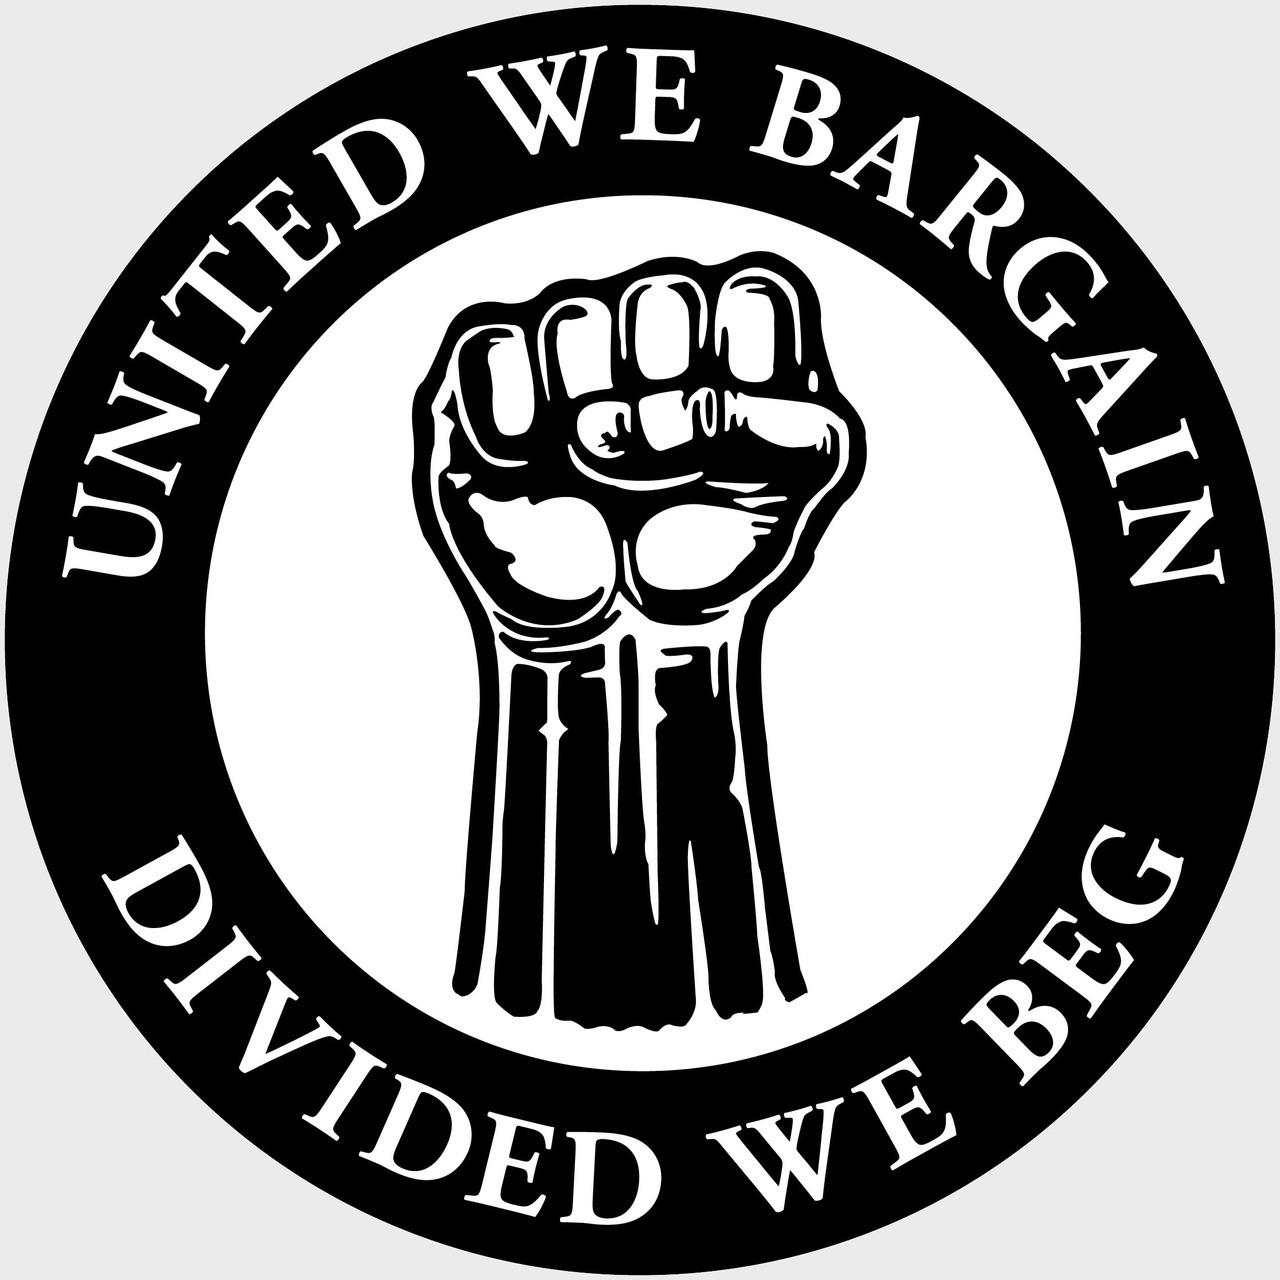 united_we_bargain__72672-1405444470-1280-1280